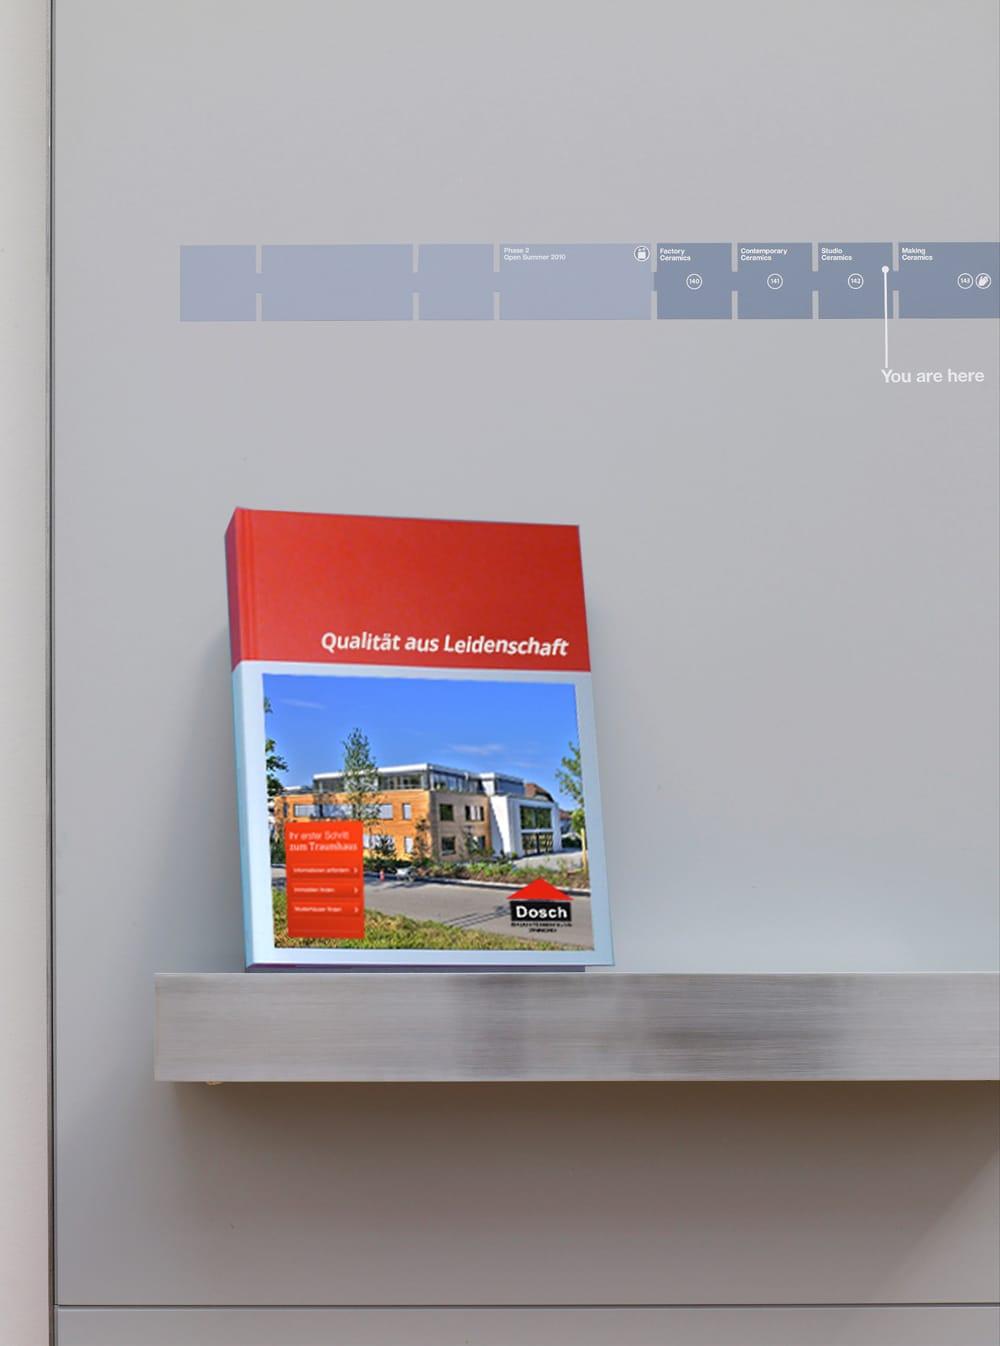 Katalog Design Althammer Studios für Dosch Bau